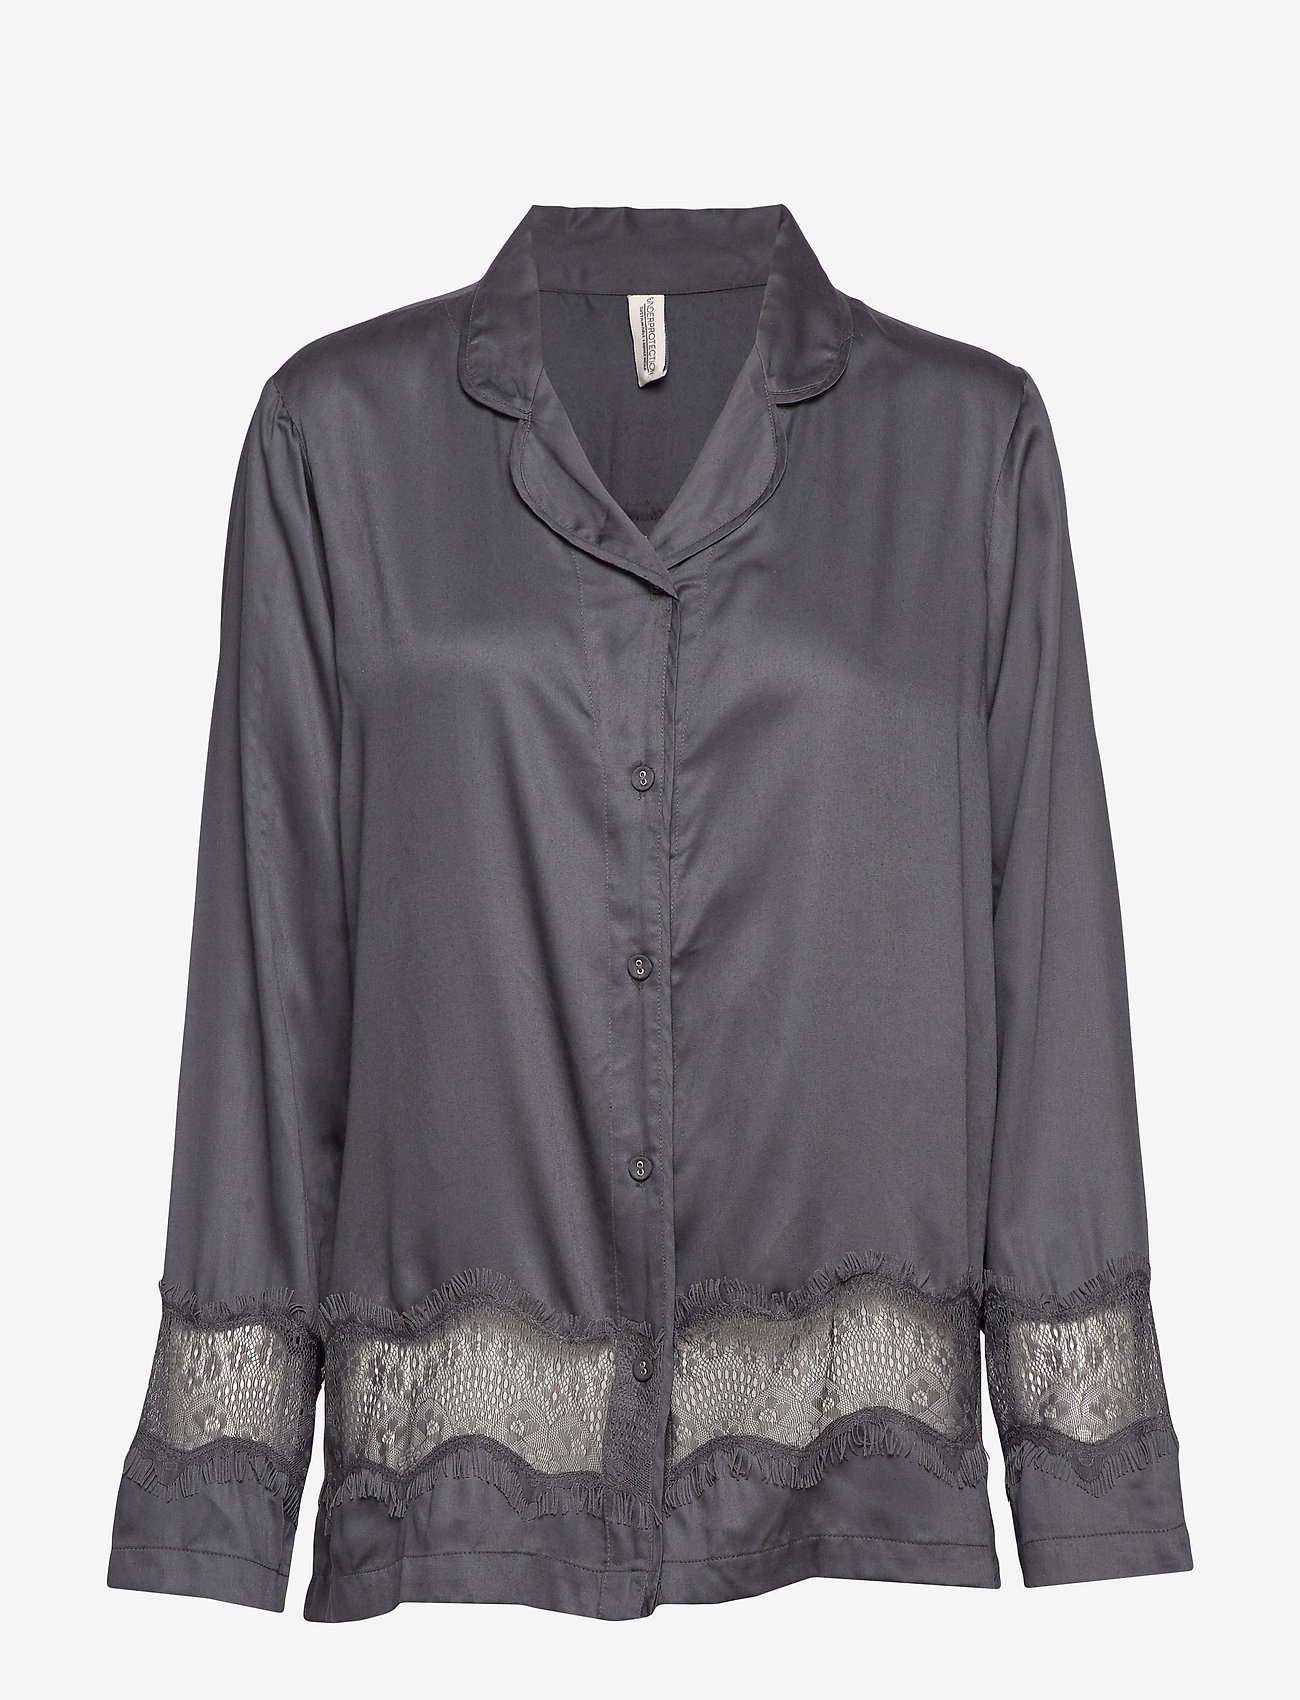 Underprotection - lulu shirt - Överdelar - grey - 0